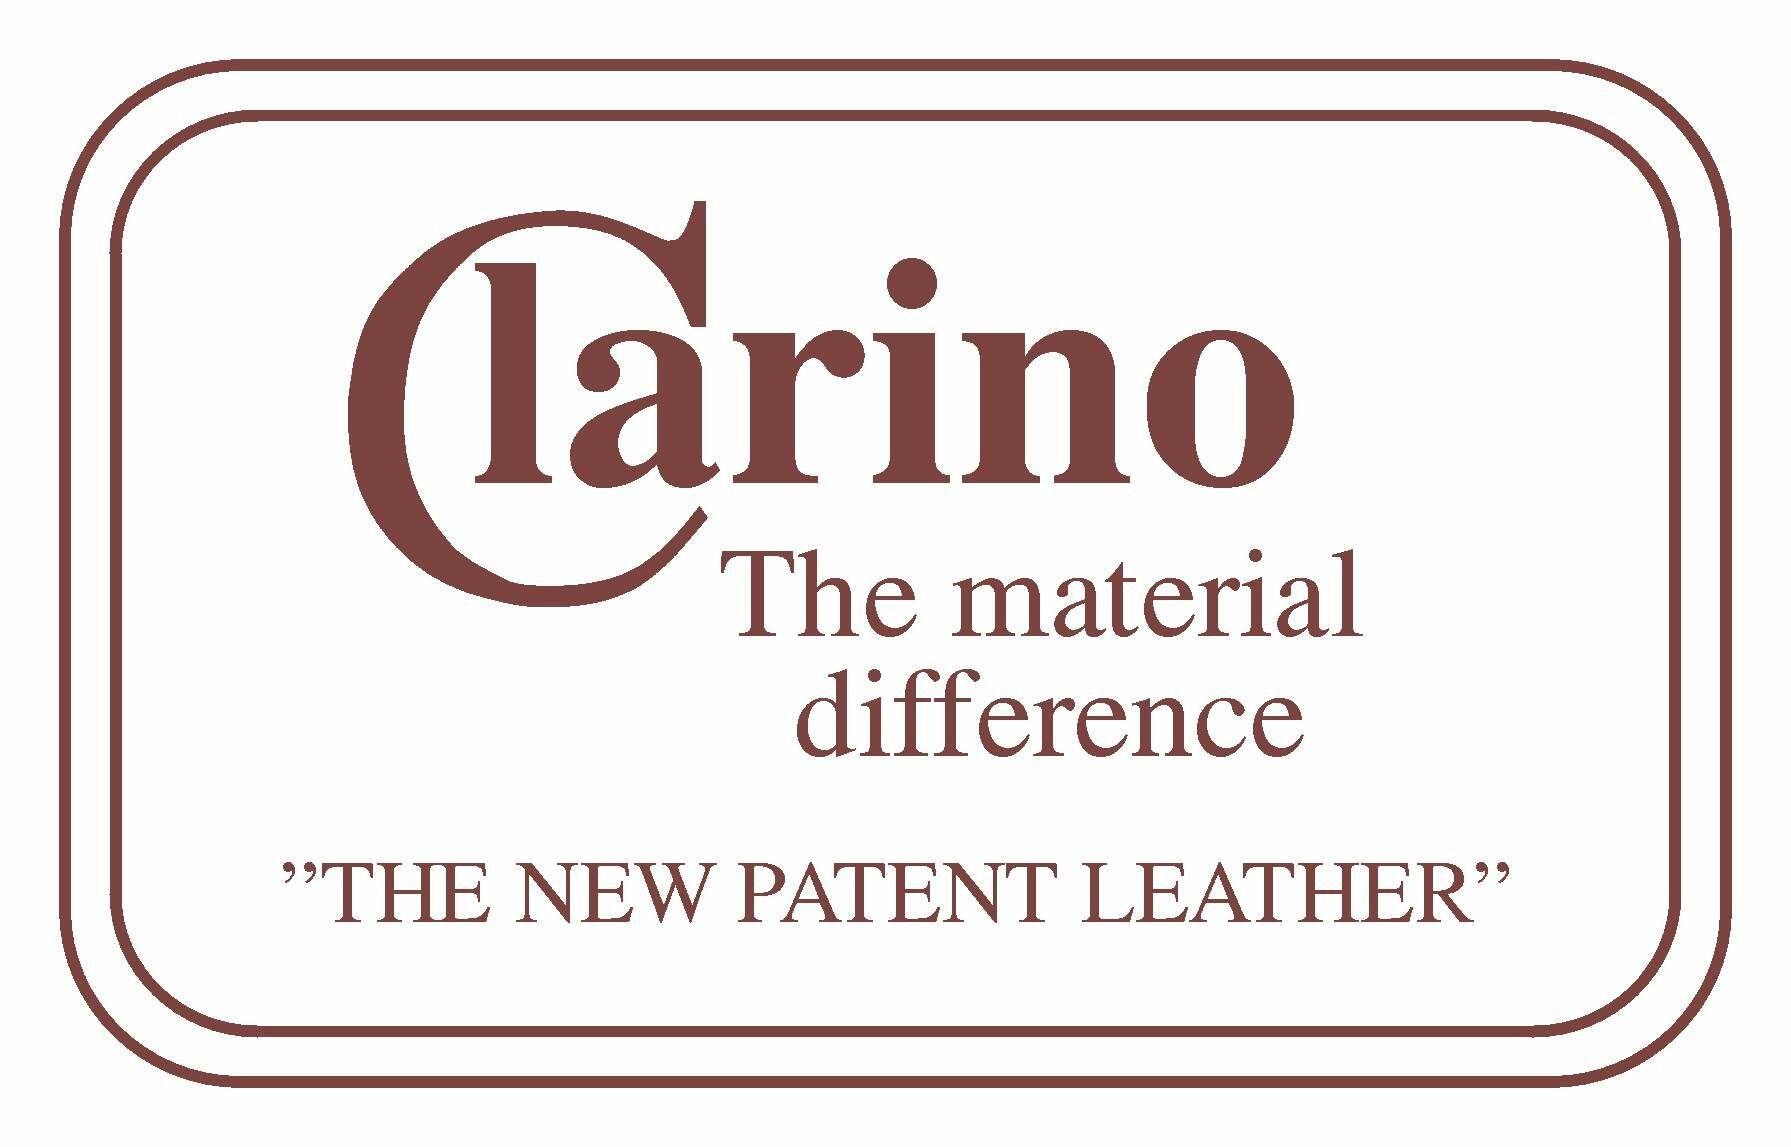 8_Clarino_Logo.jpg